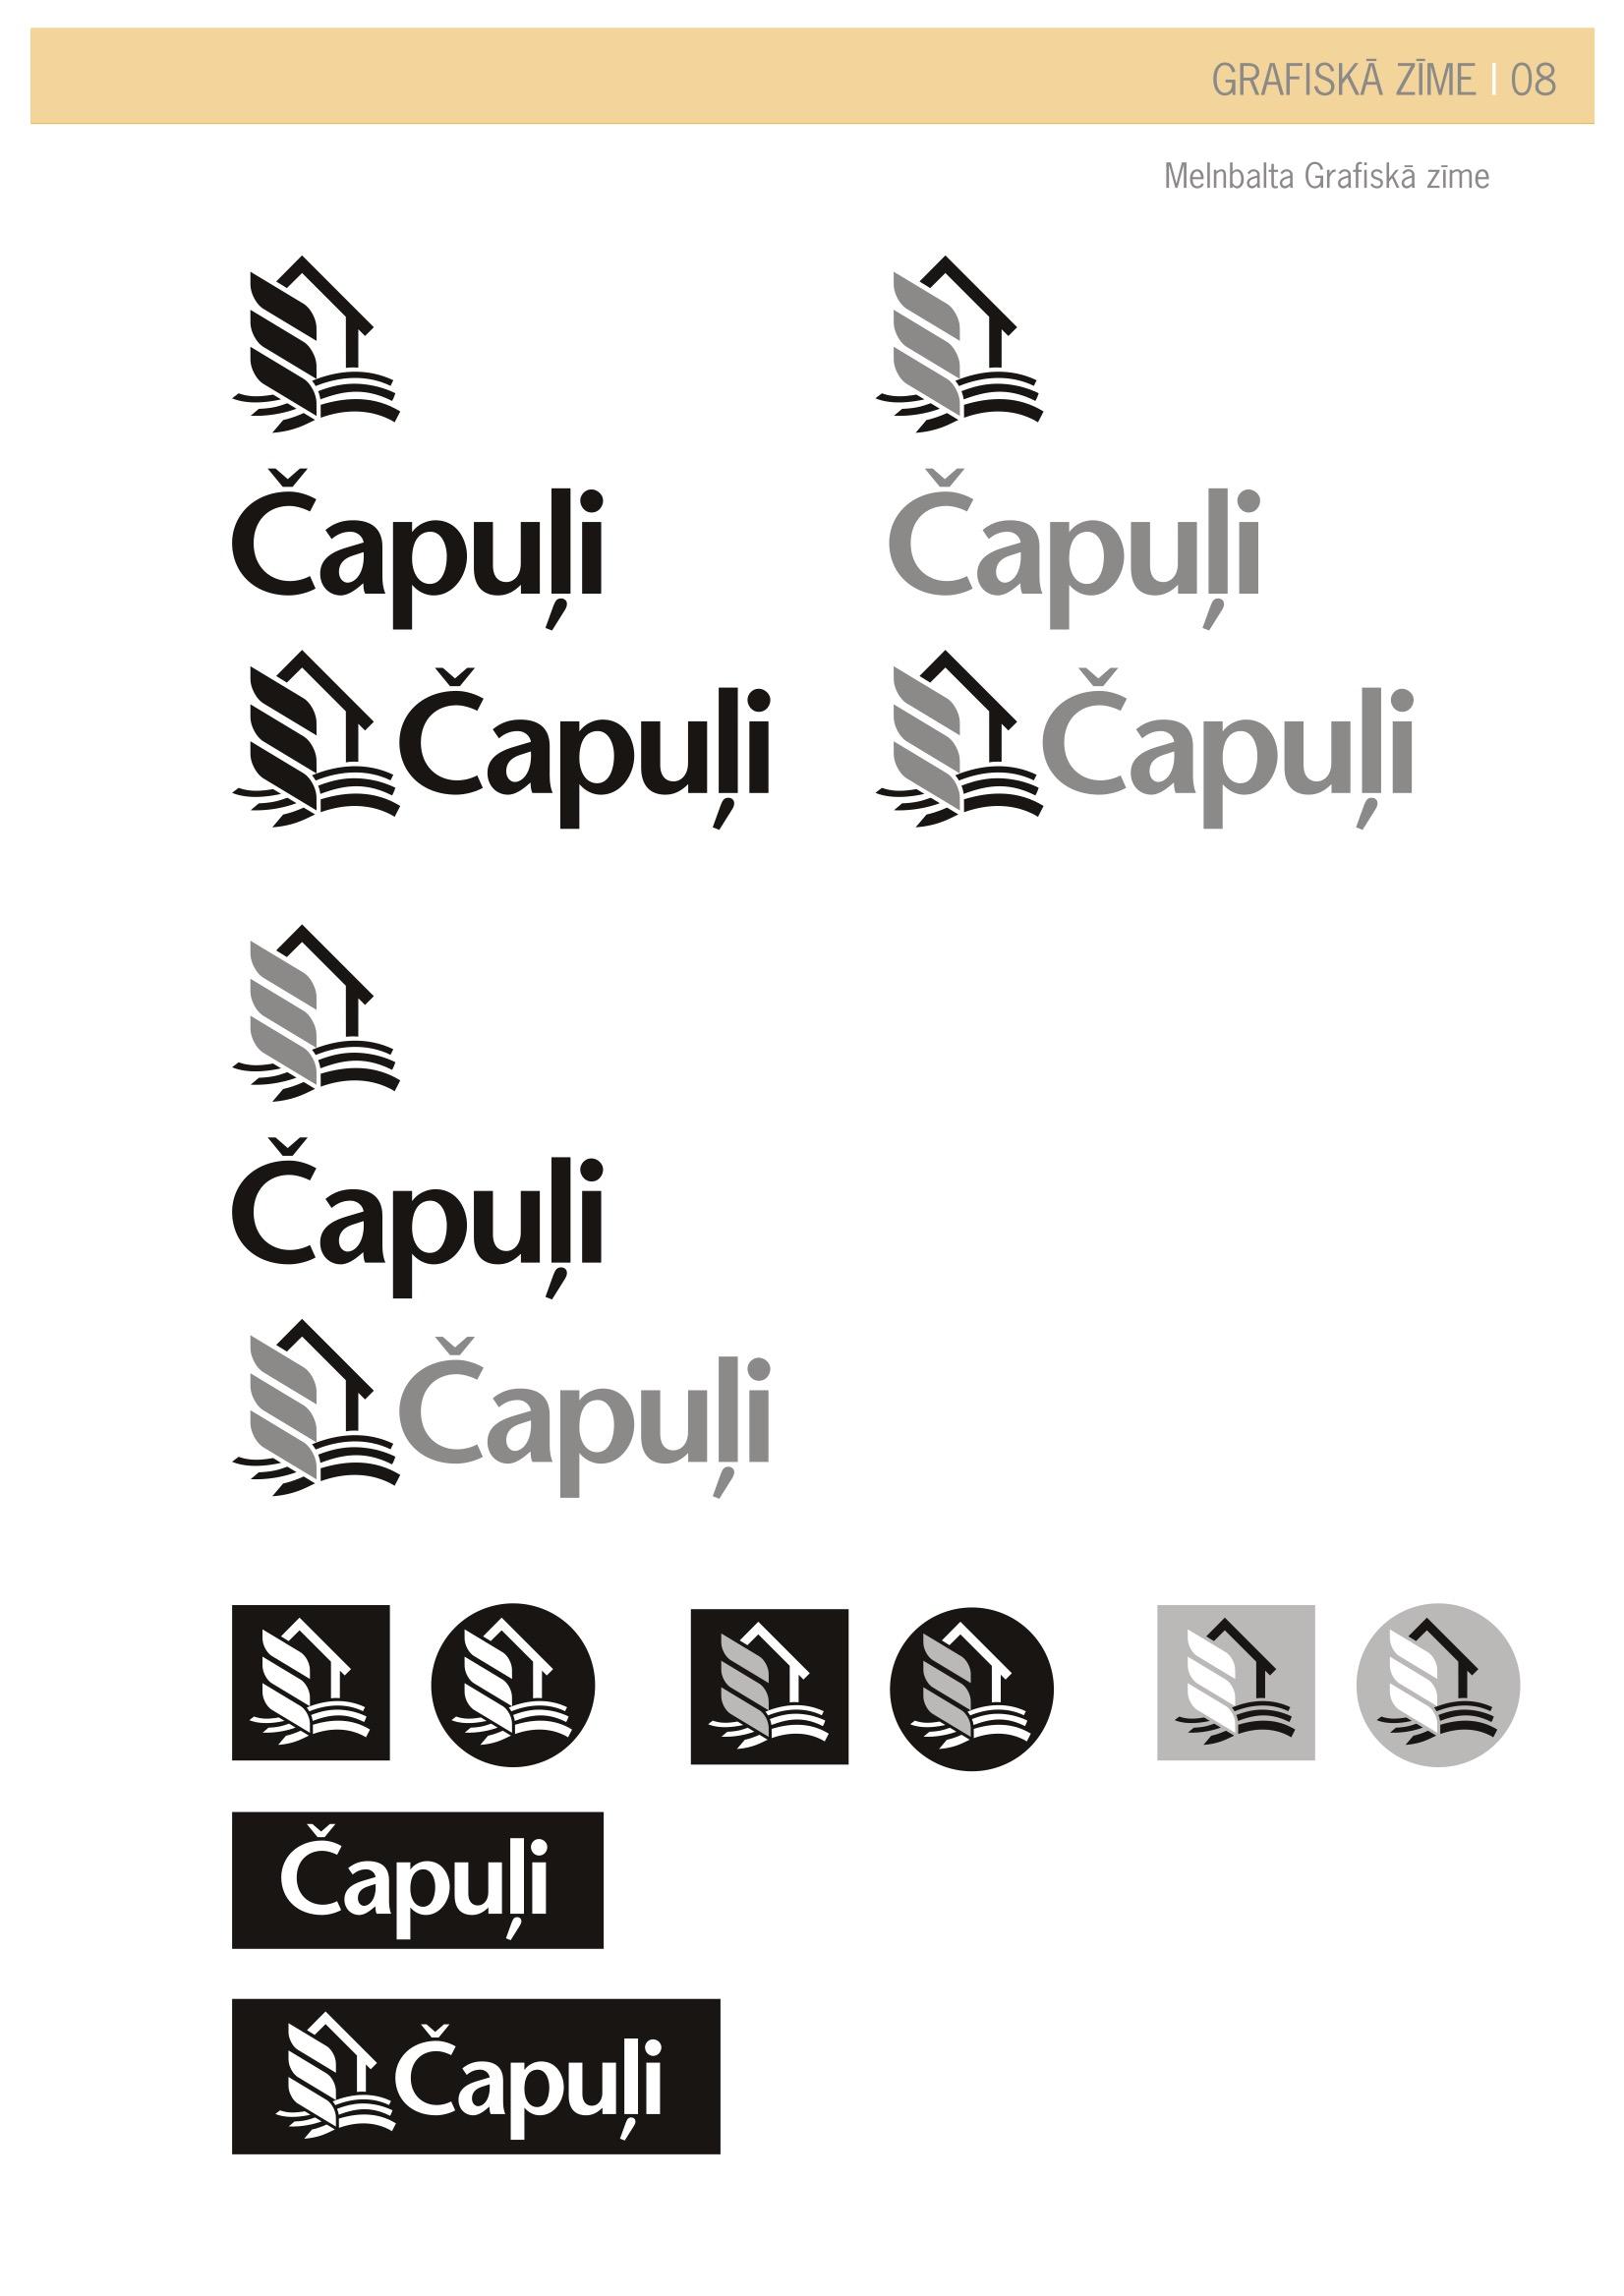 Chapulji_Stils 8